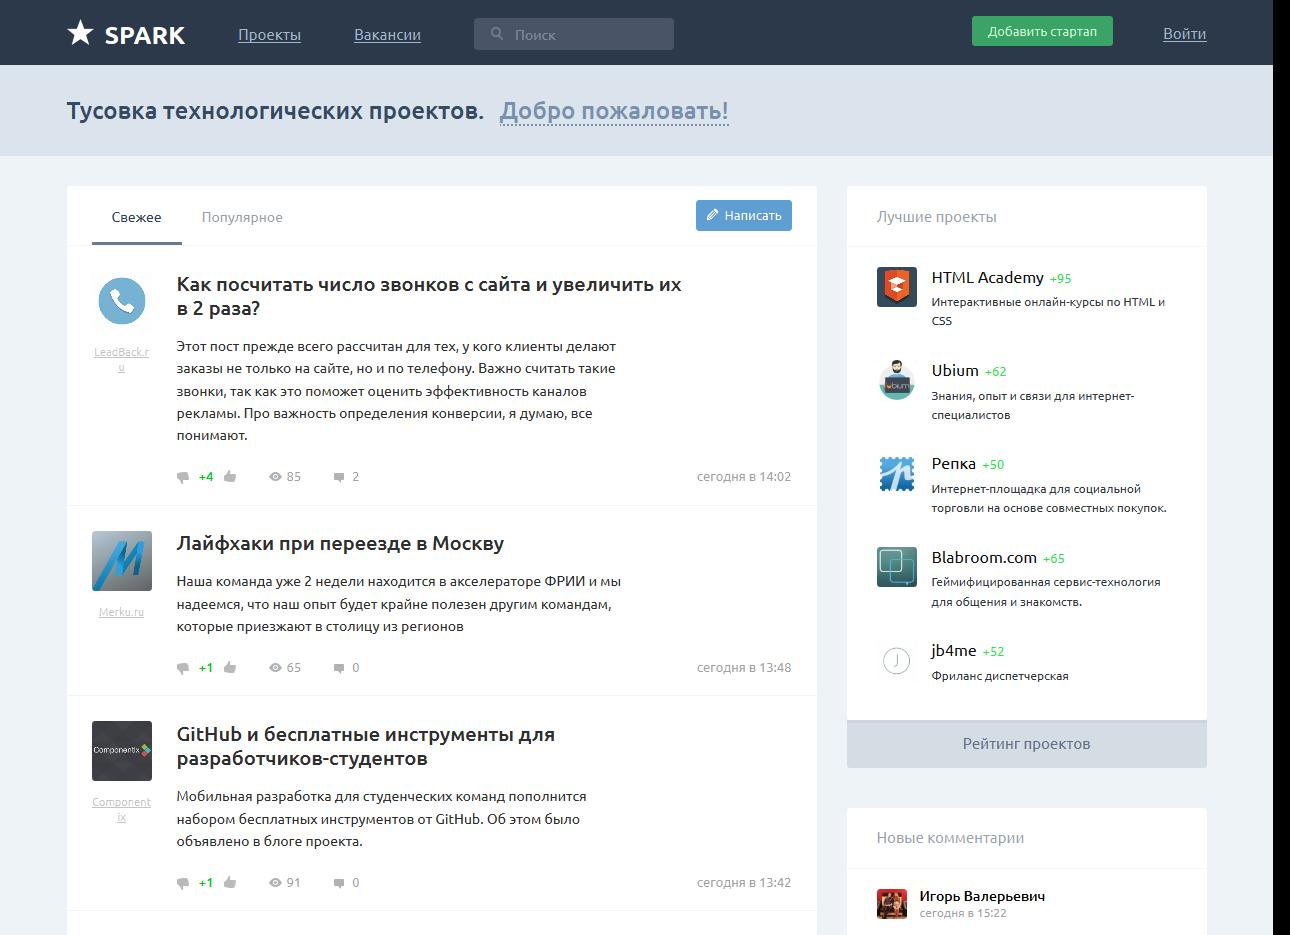 Цыплухин запустил «Хабр» для стартапов